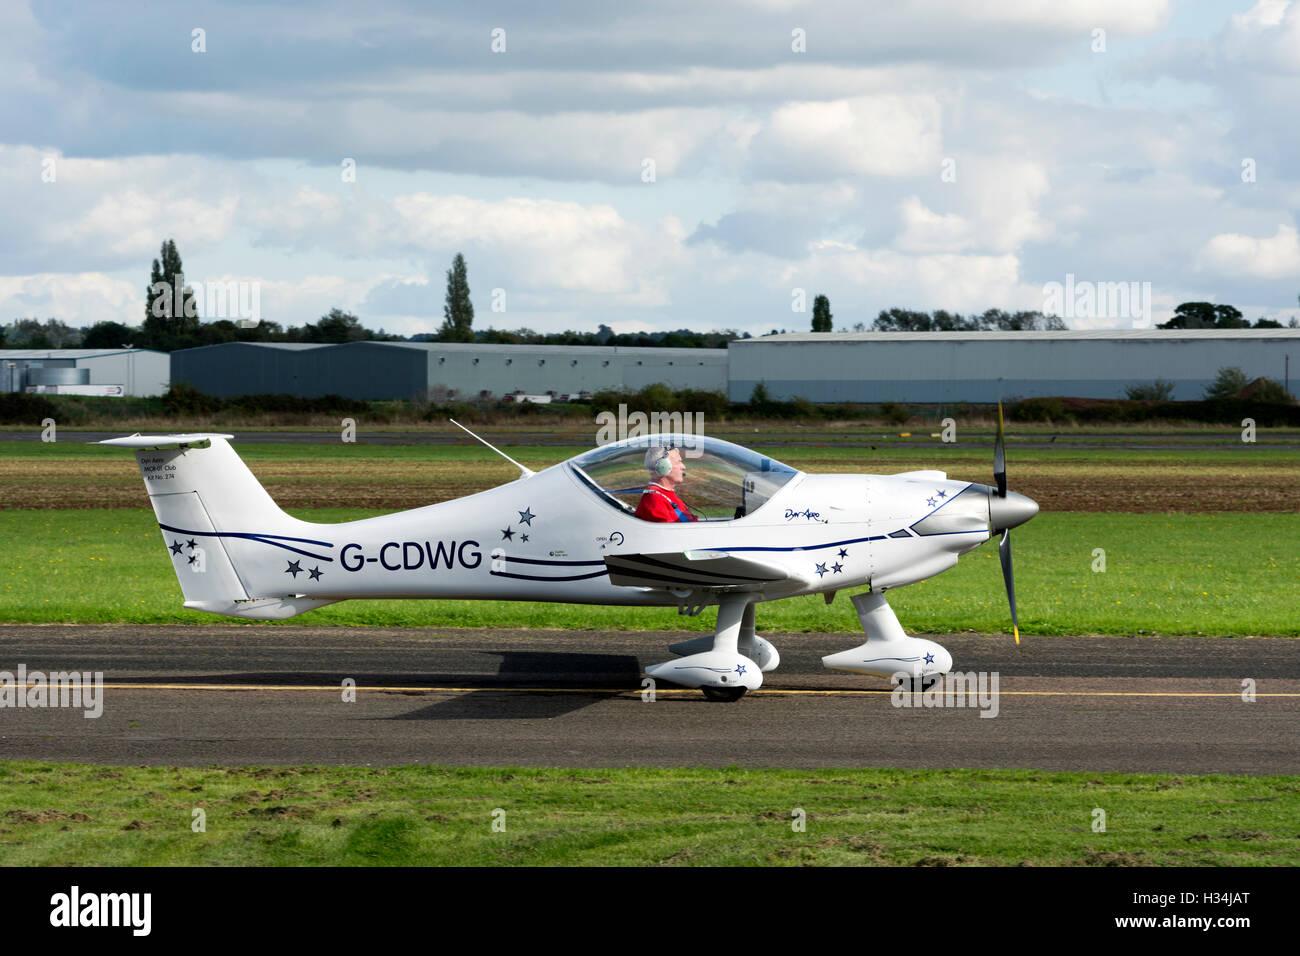 Dyn`Aero MCR-01 Club at Wellesbourne Airfield, Warwickshire, UK (G-CDWG) - Stock Image